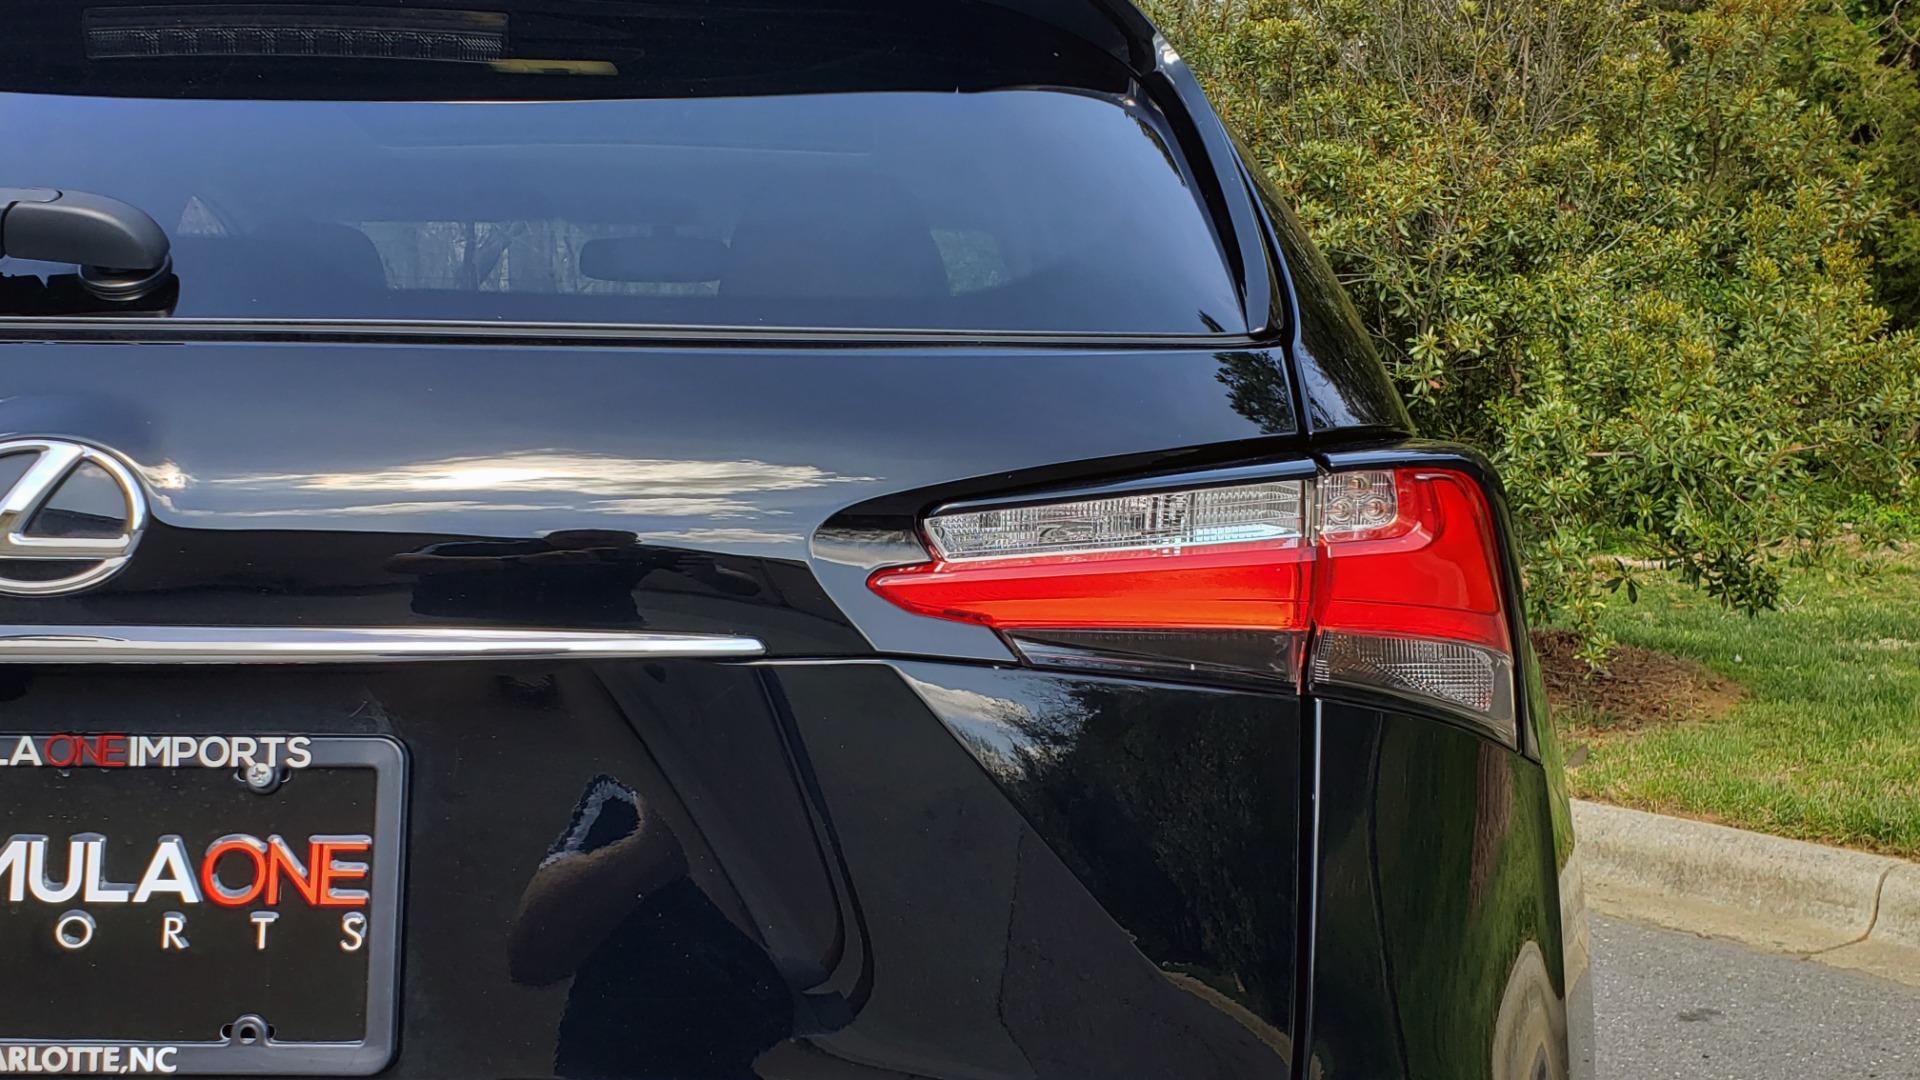 Used 2016 Lexus NX 200T PREM PKG / NAV / SUNROOF / PRE-COLLISION / PARK ASST for sale Sold at Formula Imports in Charlotte NC 28227 29